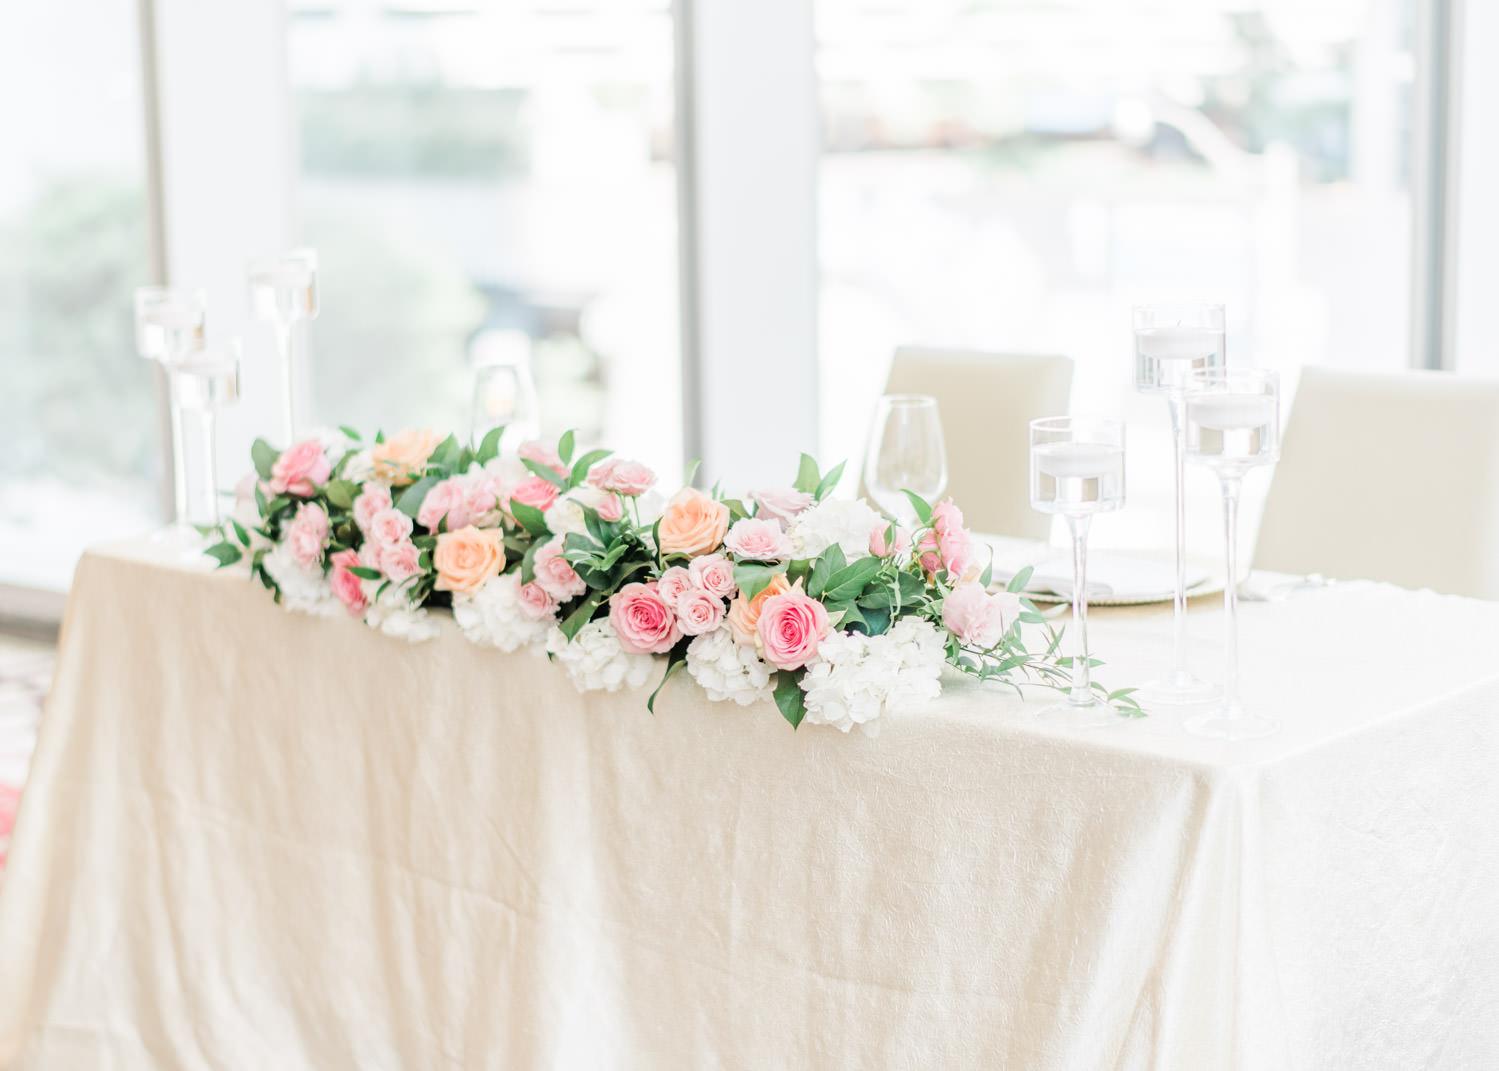 Elegant wedding reception at the Shangri-La Hotel in Toronto